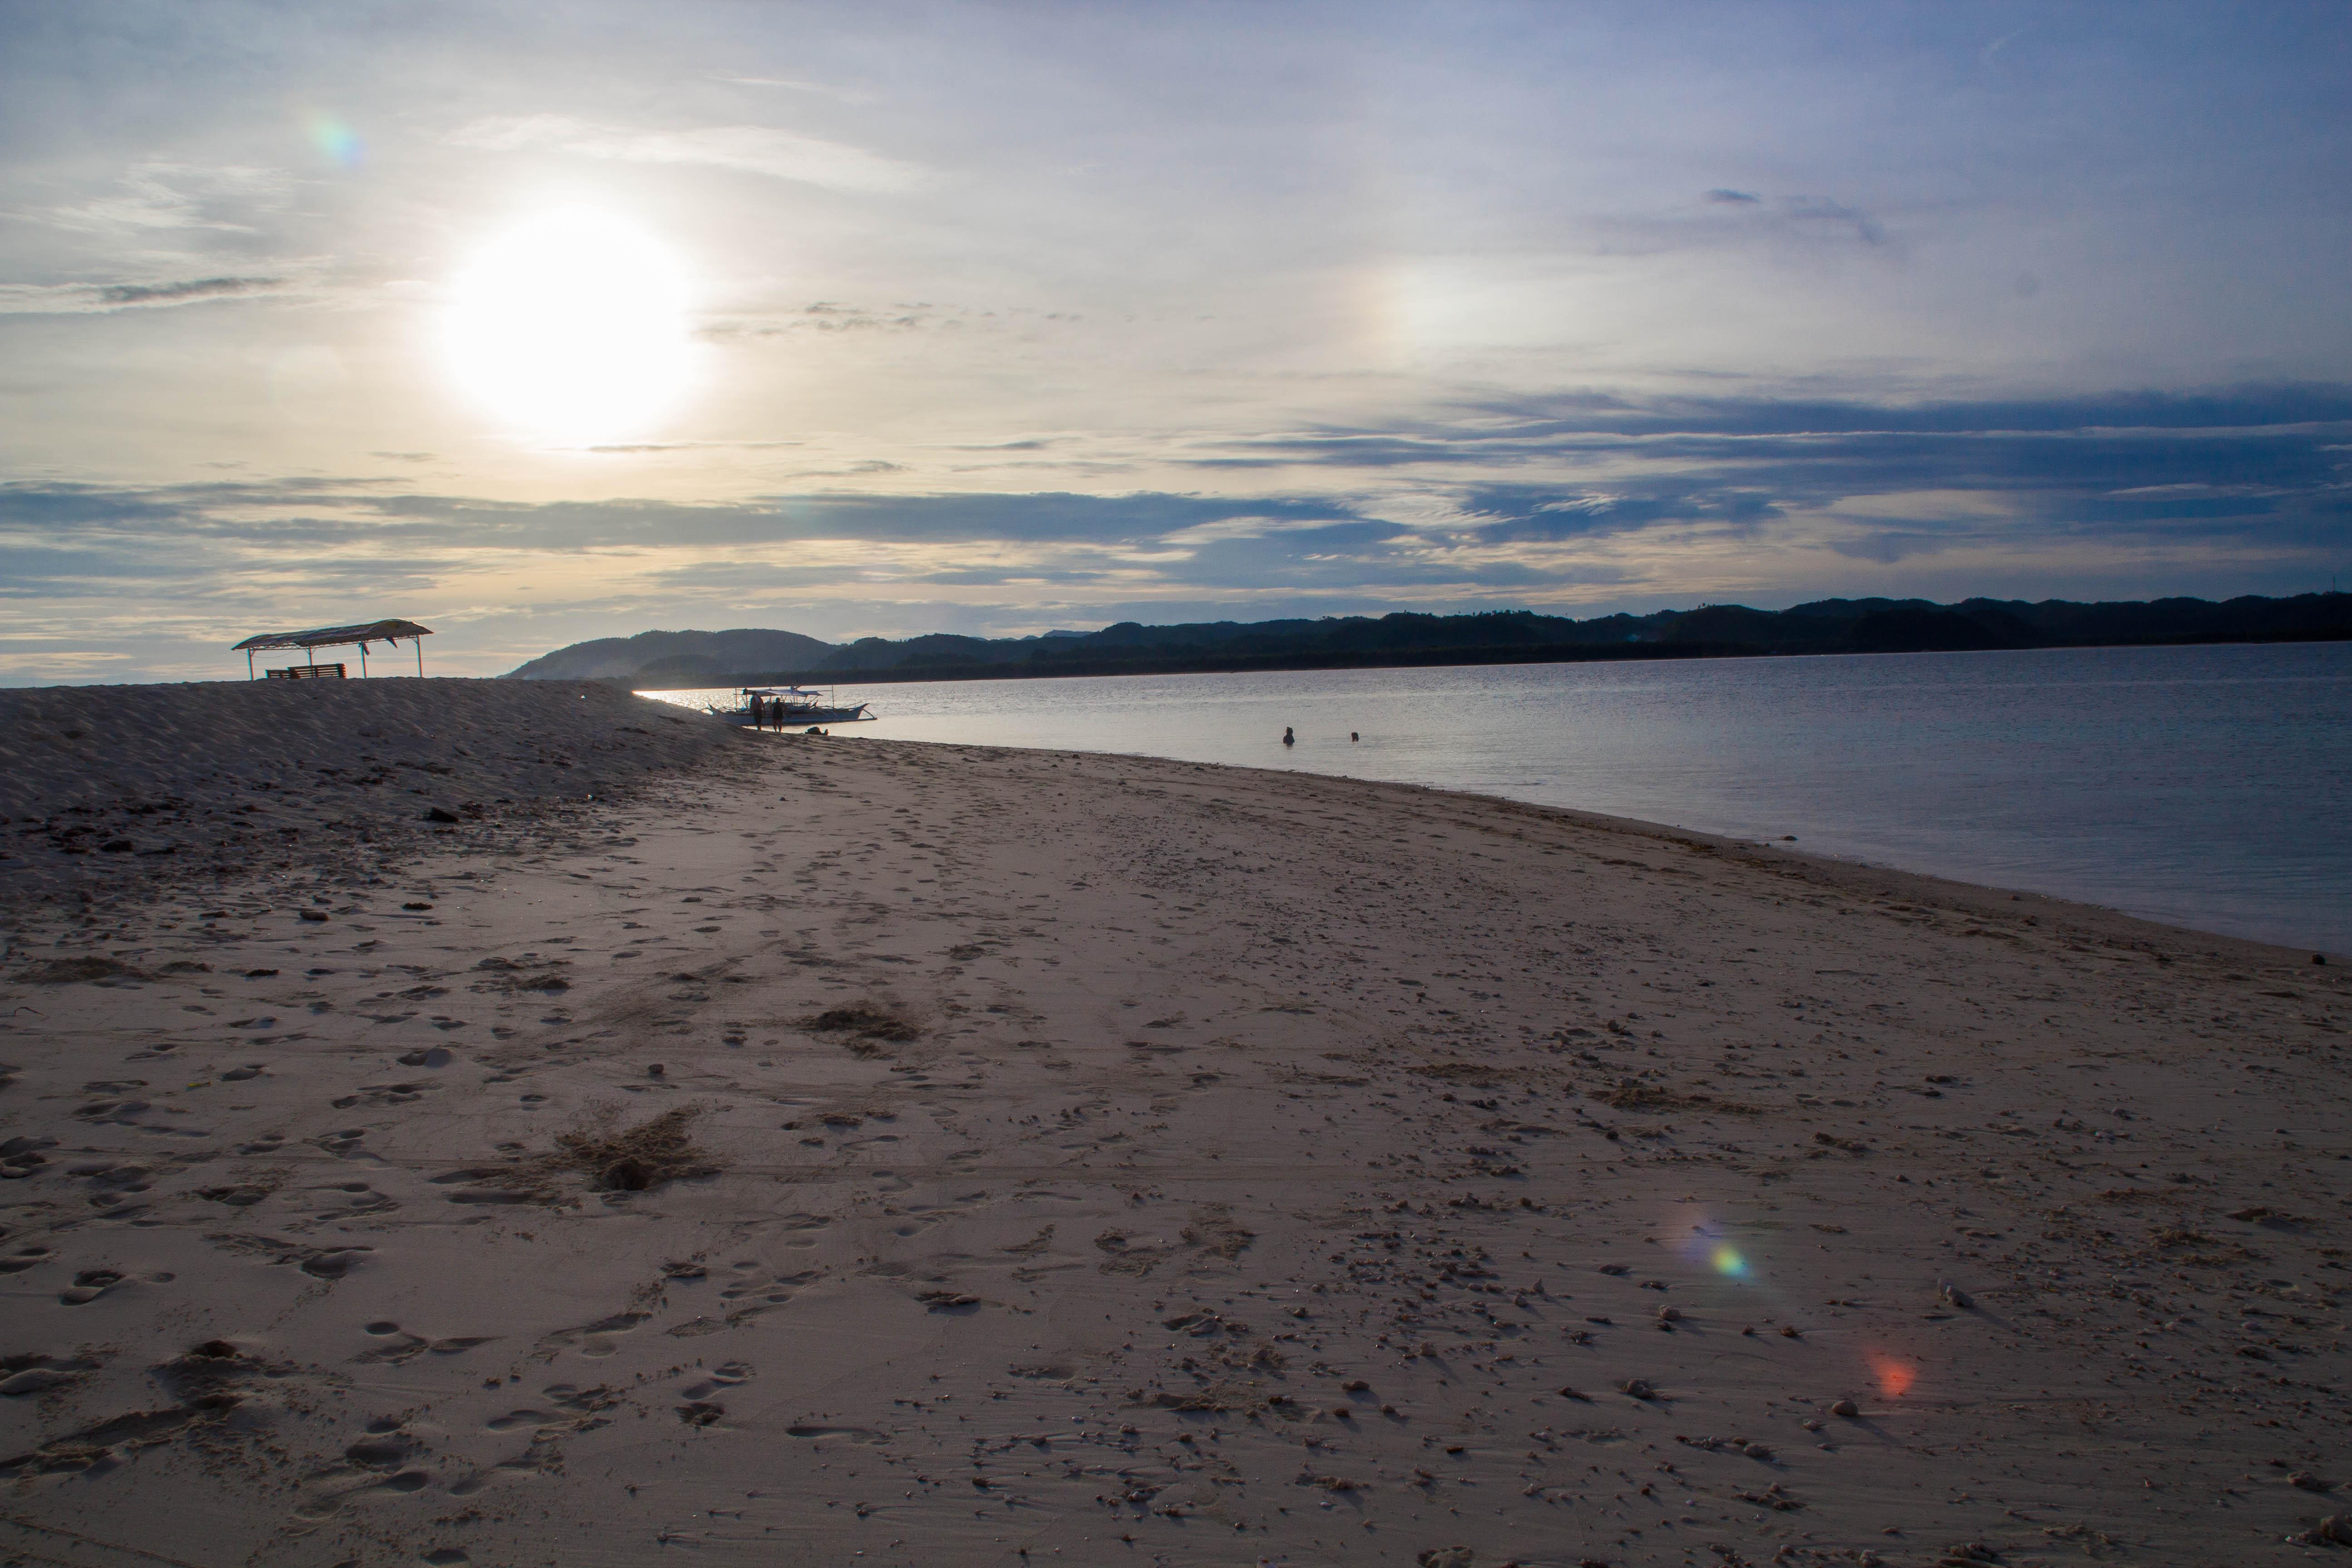 Solnedgång på Naked Island. Foto: Patrik Enlund